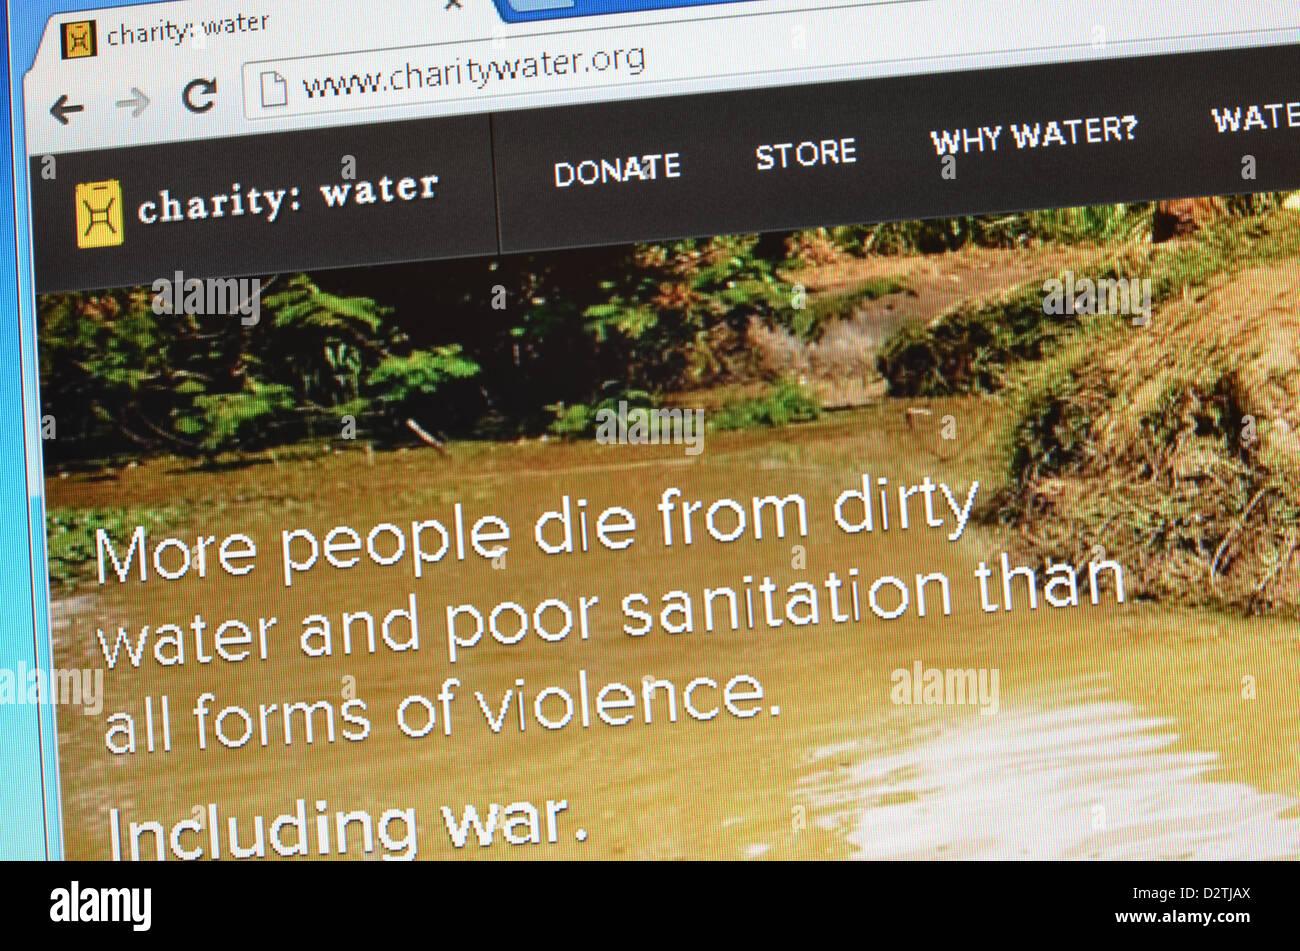 Charity Water website screenshot - Stock Image